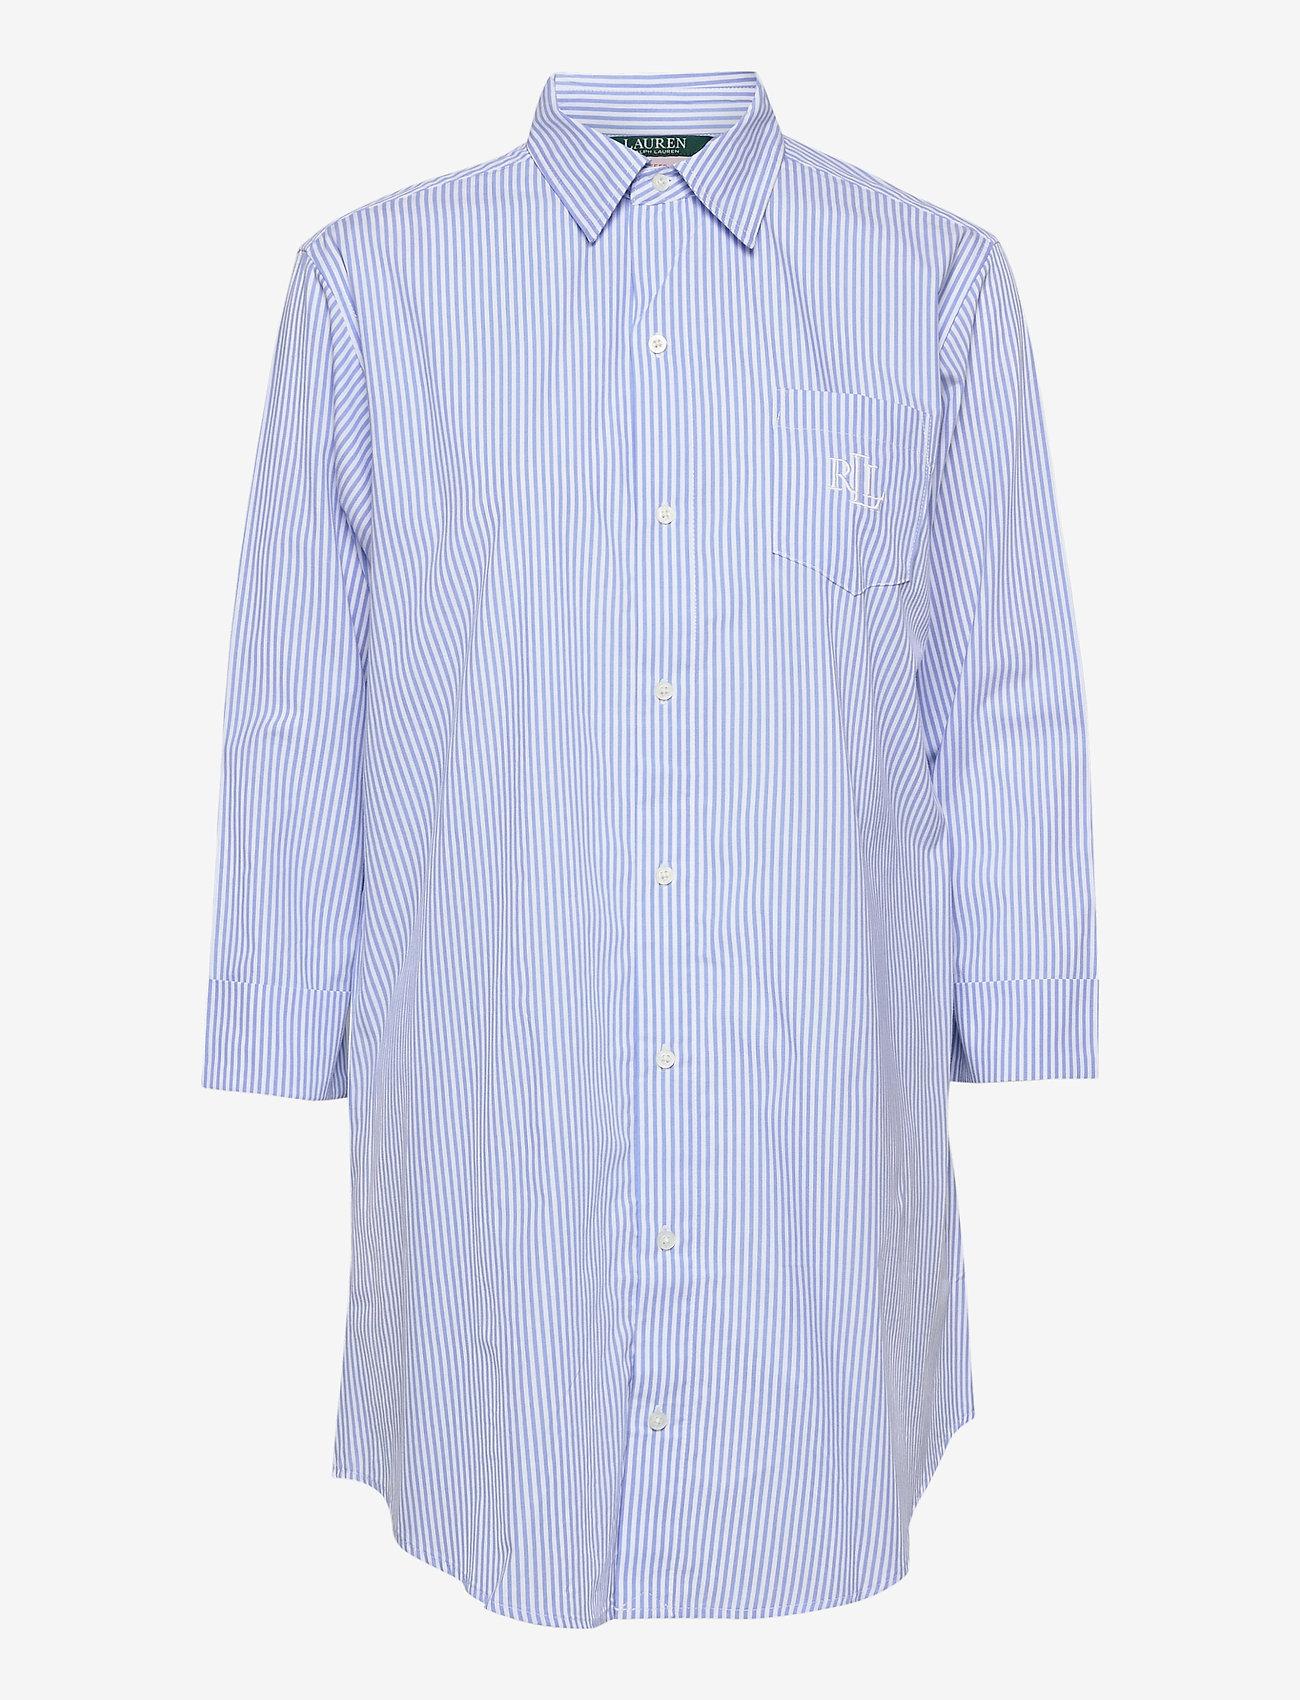 Lauren Ralph Lauren Homewear - LRL HERITAGE ESS. 3/4 SL SLEEPSHIRT - overdele - french blue/white - 0